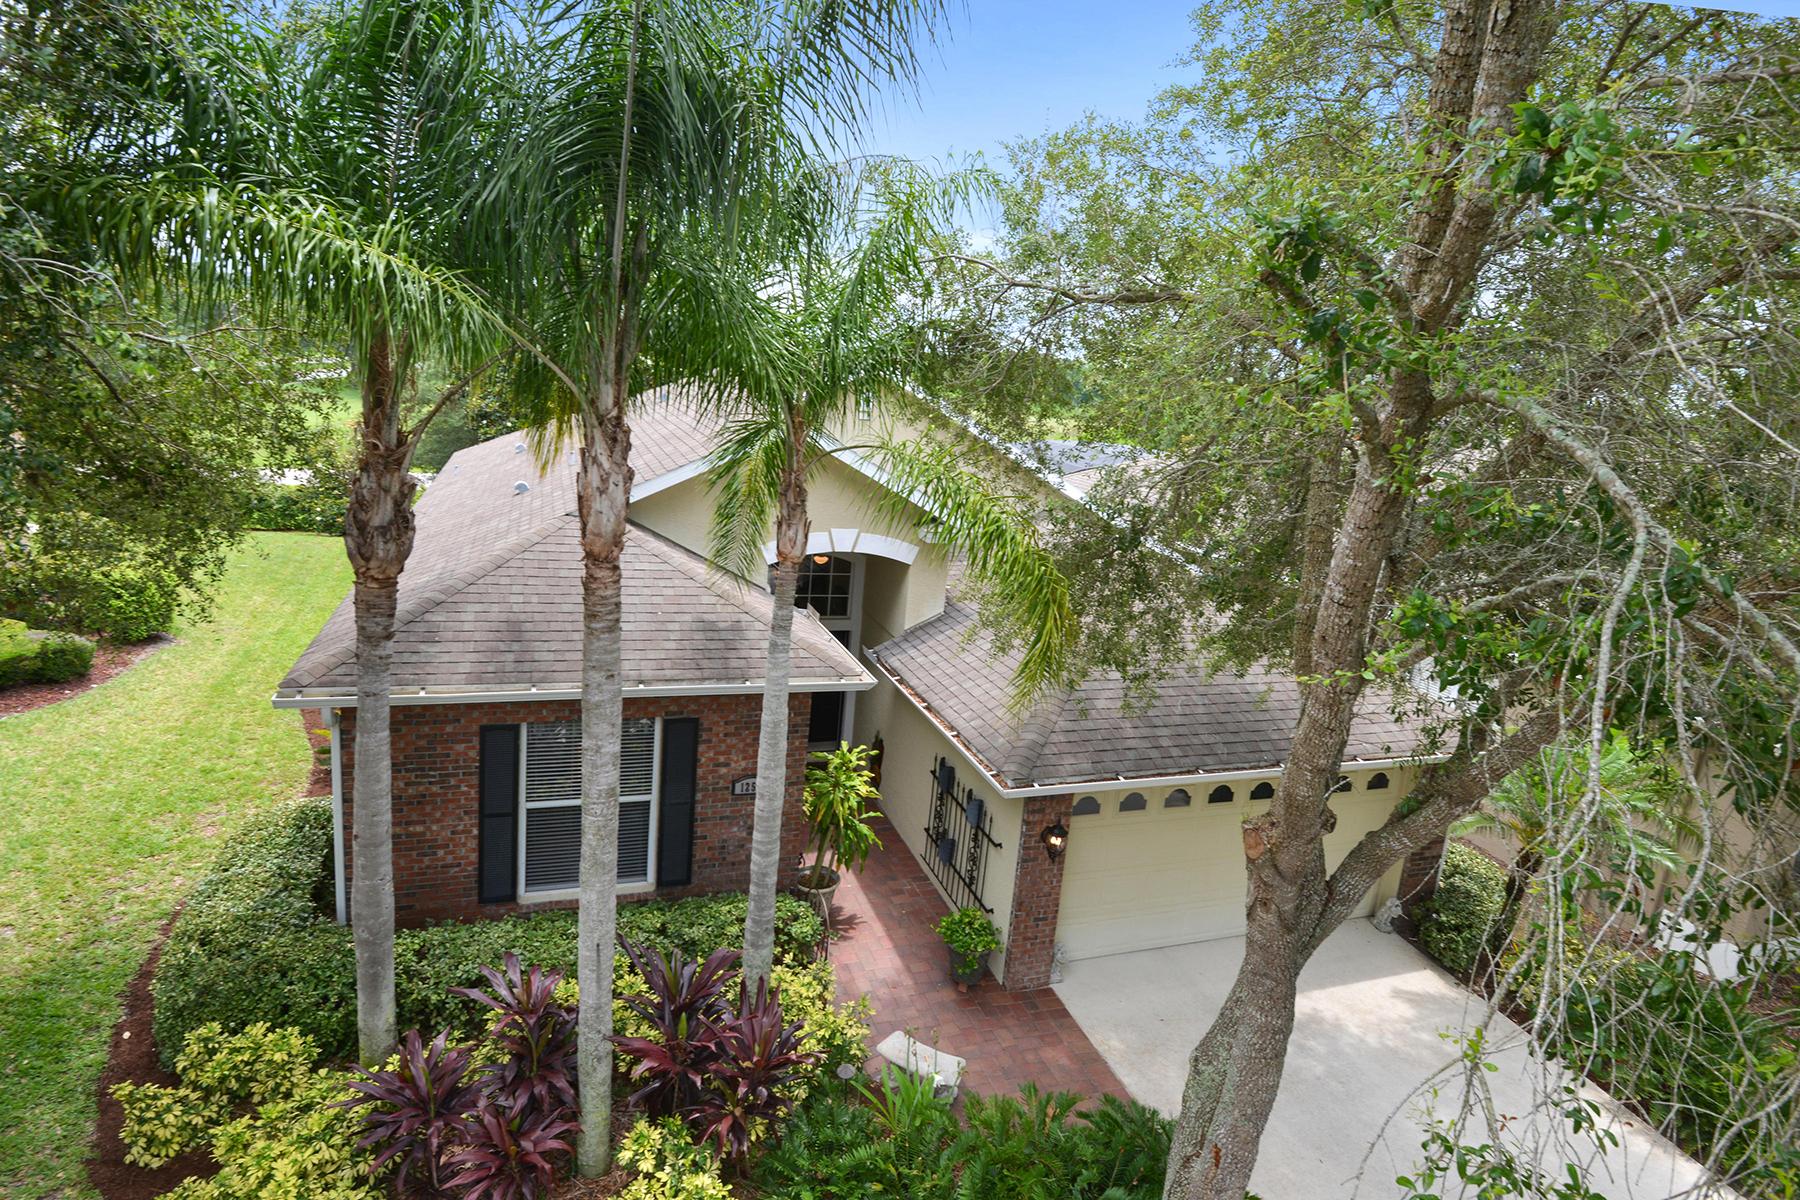 Single Family Home for Sale at ORLANDO - HEATHROW 1254 Chessington Cir Lake Mary, Florida, 32746 United States